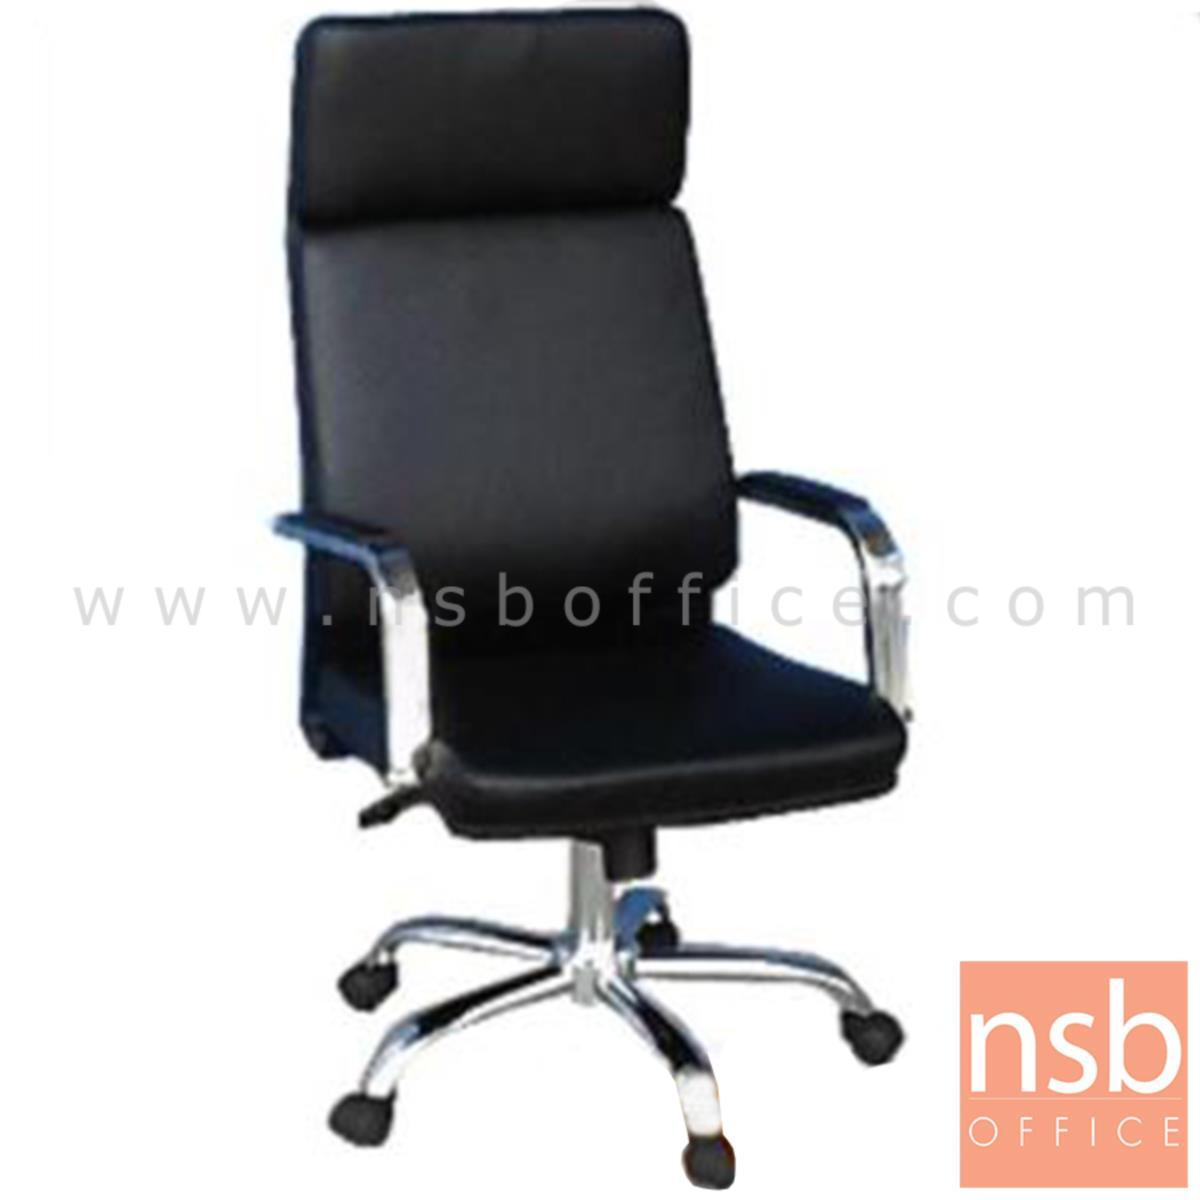 B01A336:เก้าอี้ผู้บริหาร รุ่น Ritter (ริตเตอร์)  โช๊คแก๊ส มีก้อนโยก ขาเหล็กชุบโครเมี่ยม